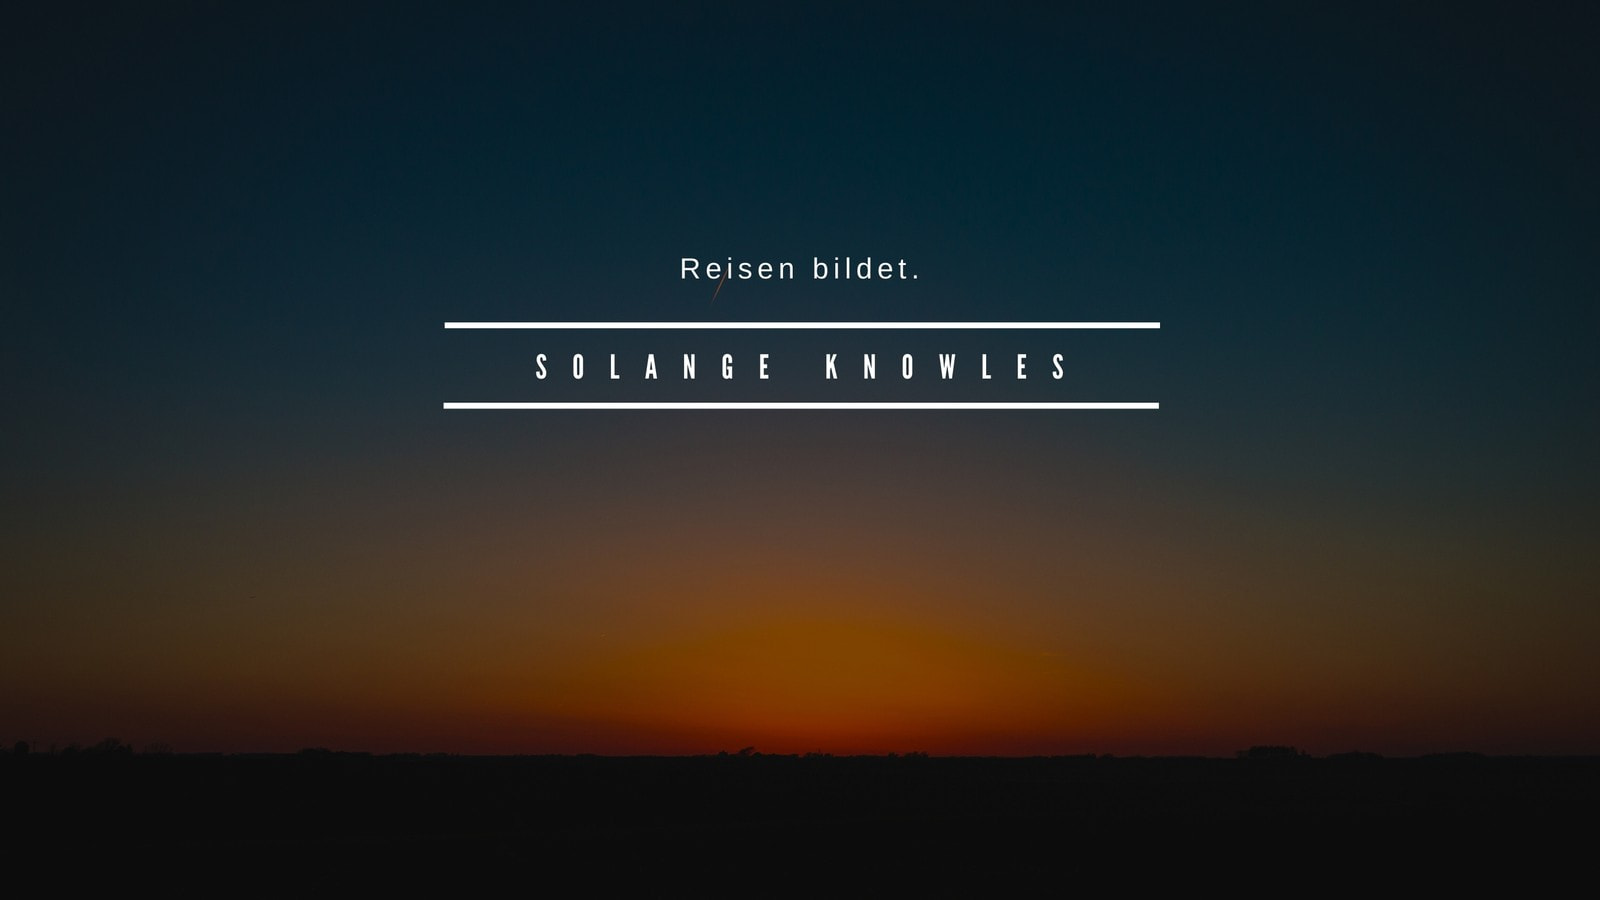 Schwarz Sonnenuntergang Horizont Foto Desktop Hintergrundbild